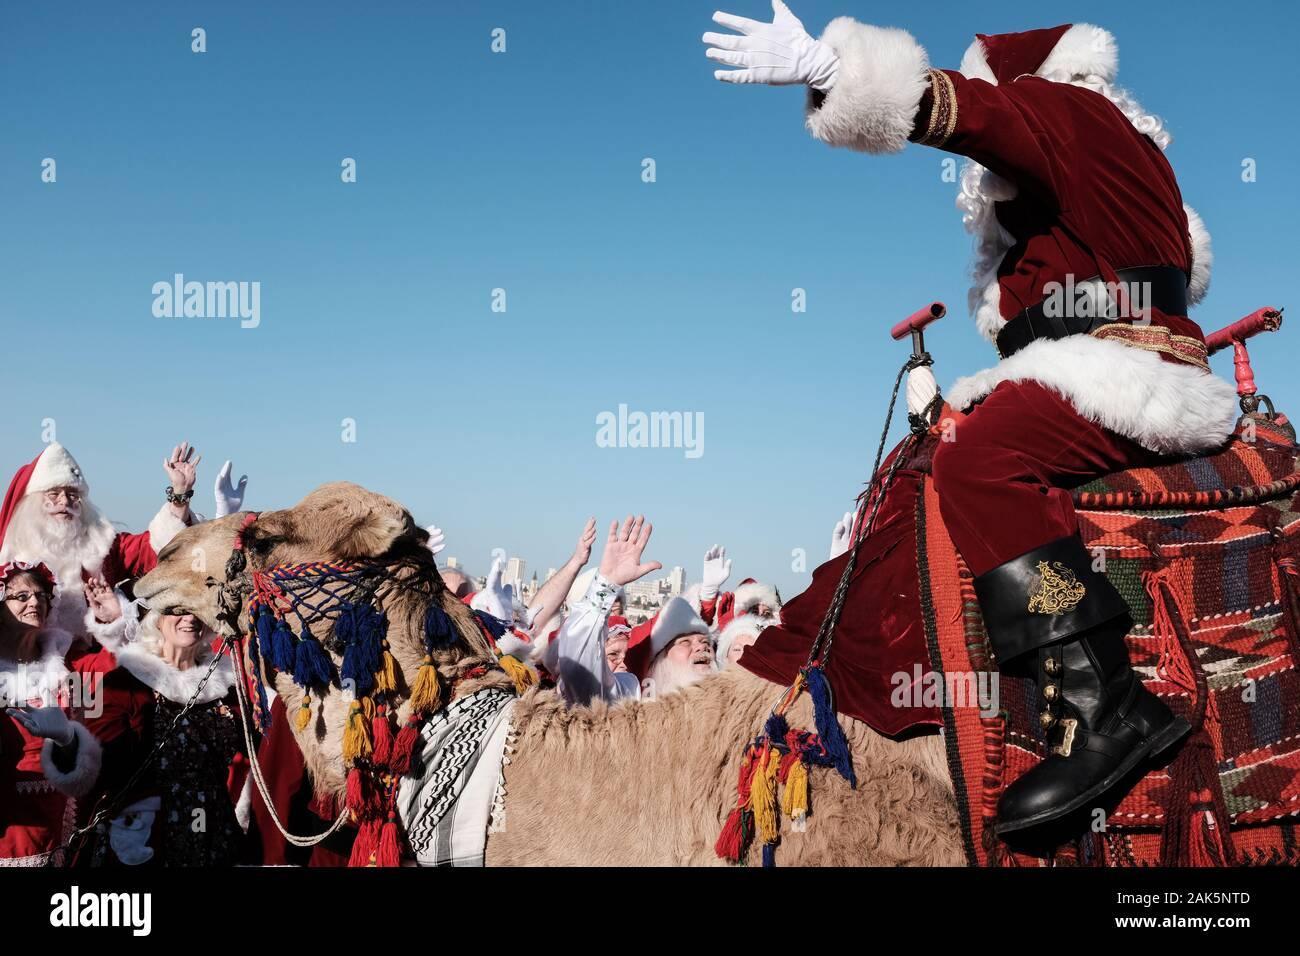 Christmas Viewing 2020 Jerusalem, Israel. 7th January, 2020. A group of some 50 Santa